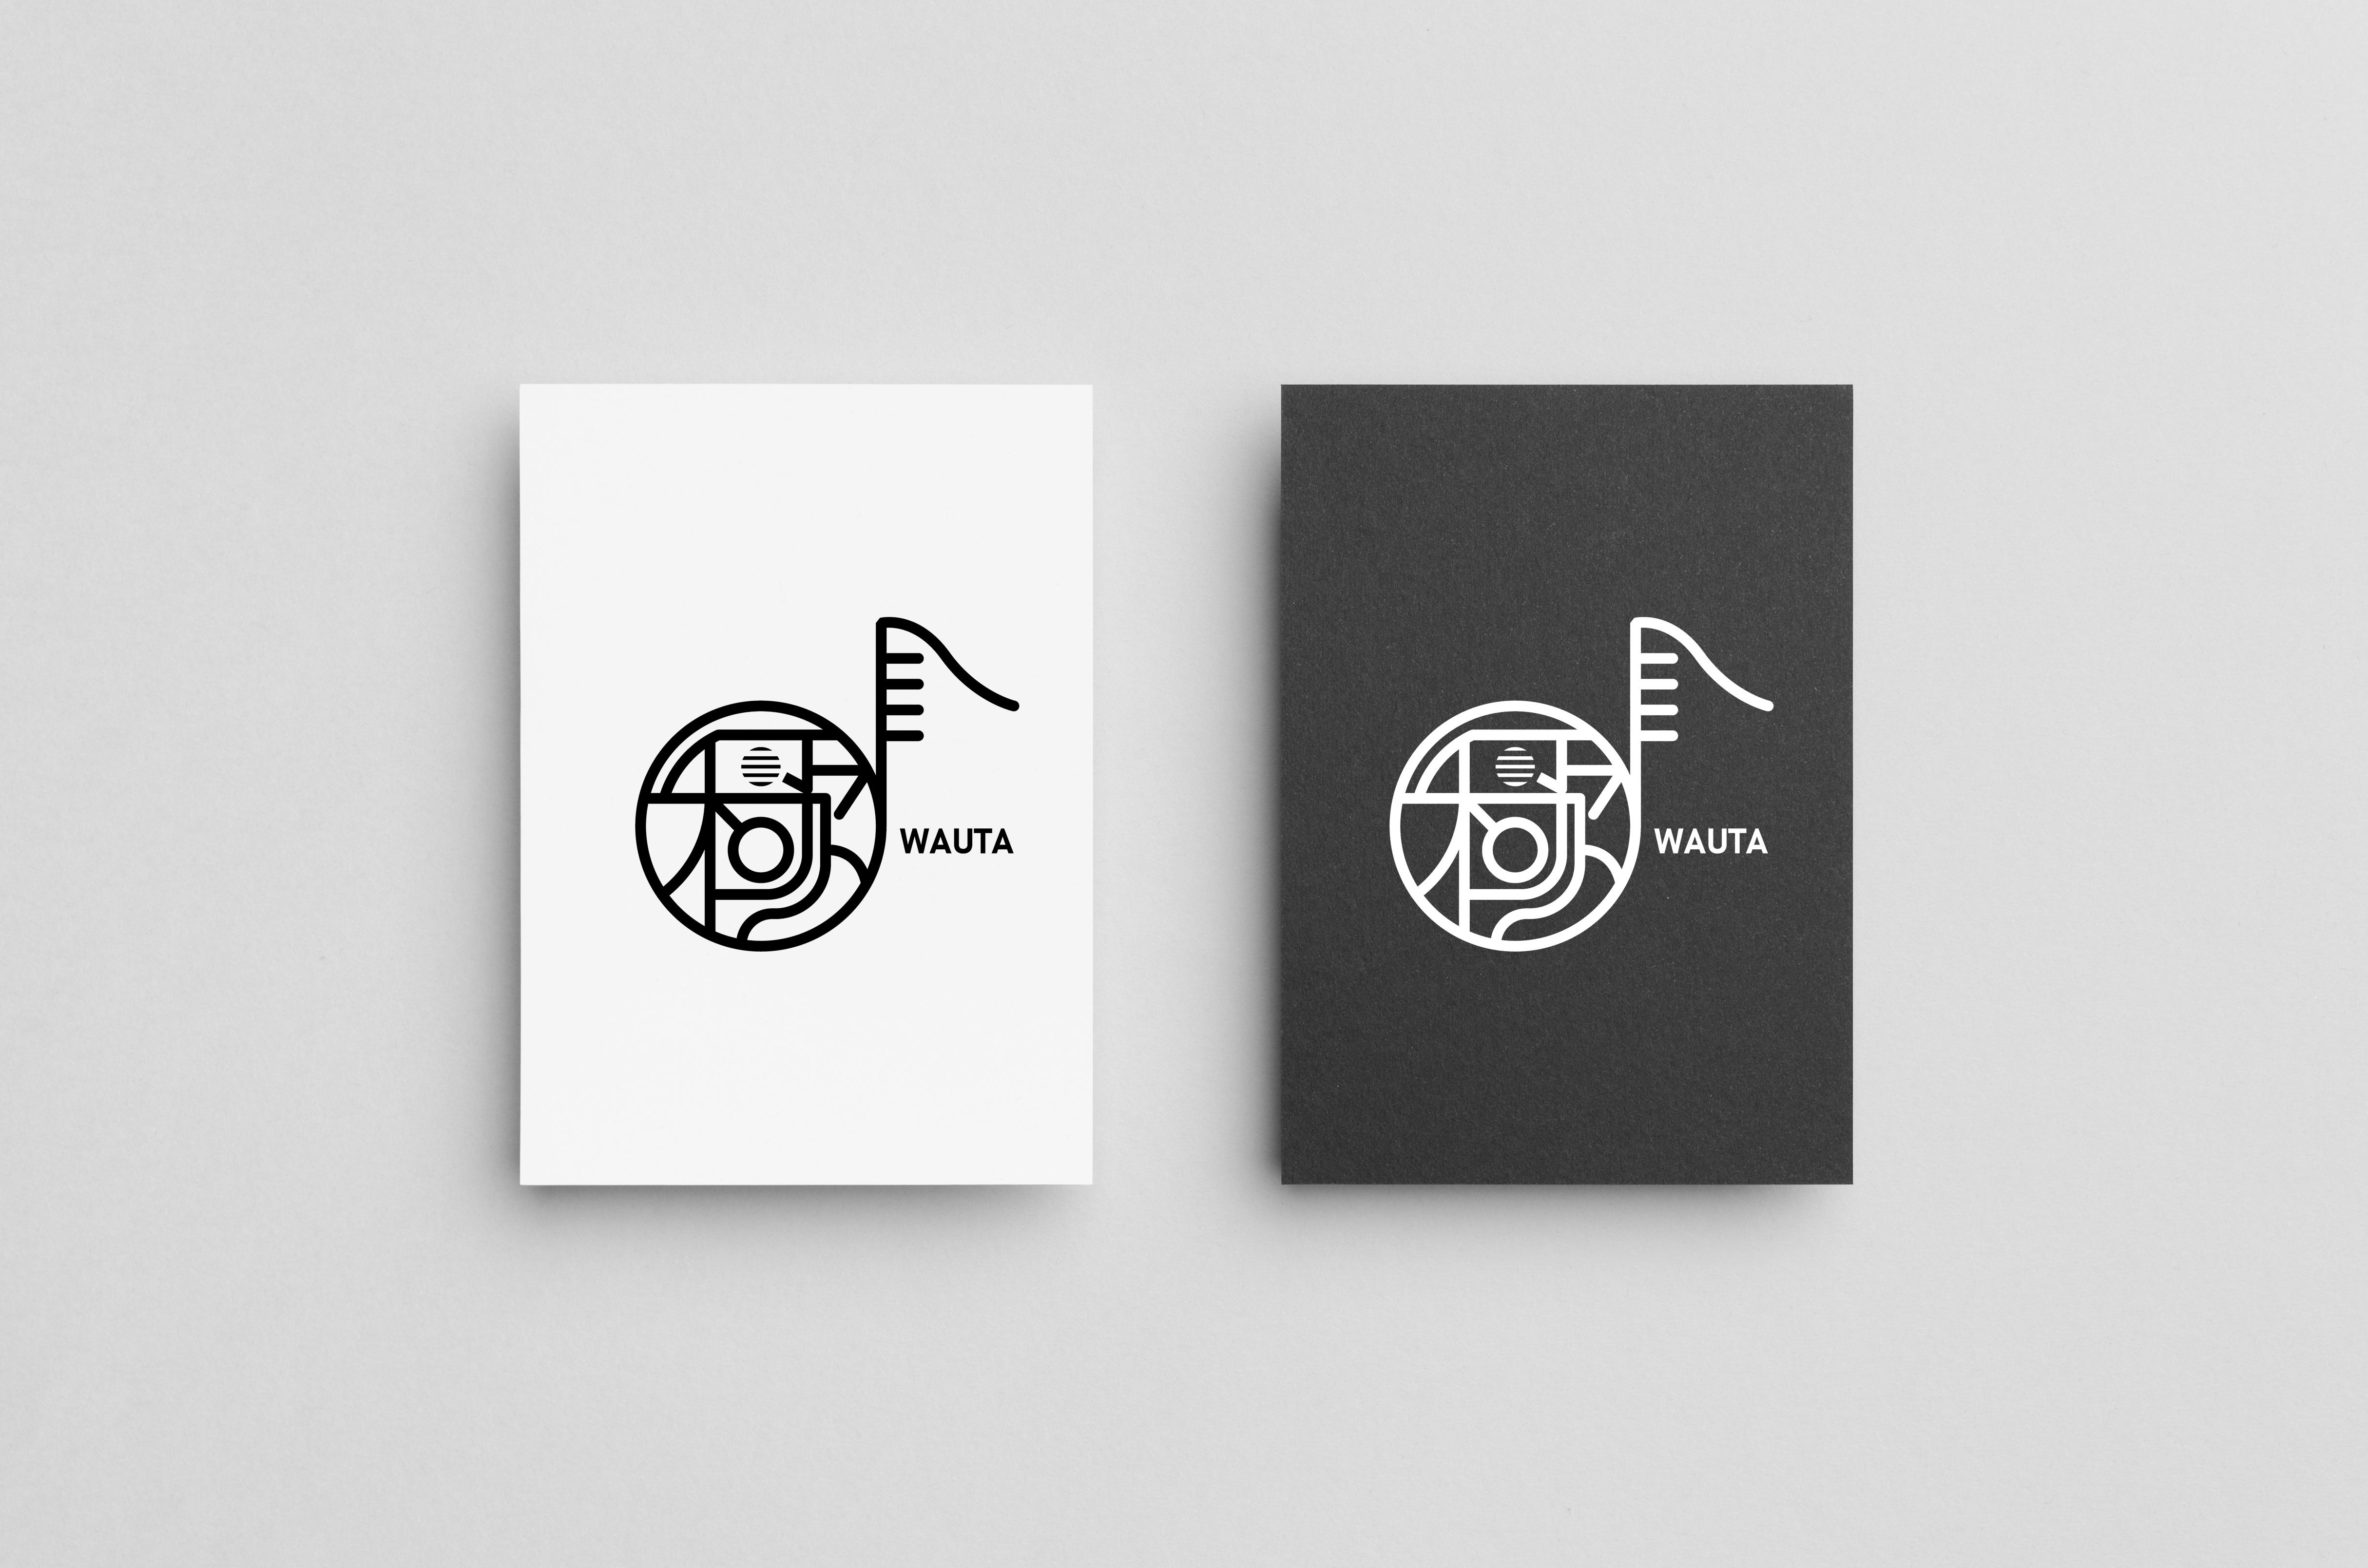 「WAUTA」ロゴデザイン